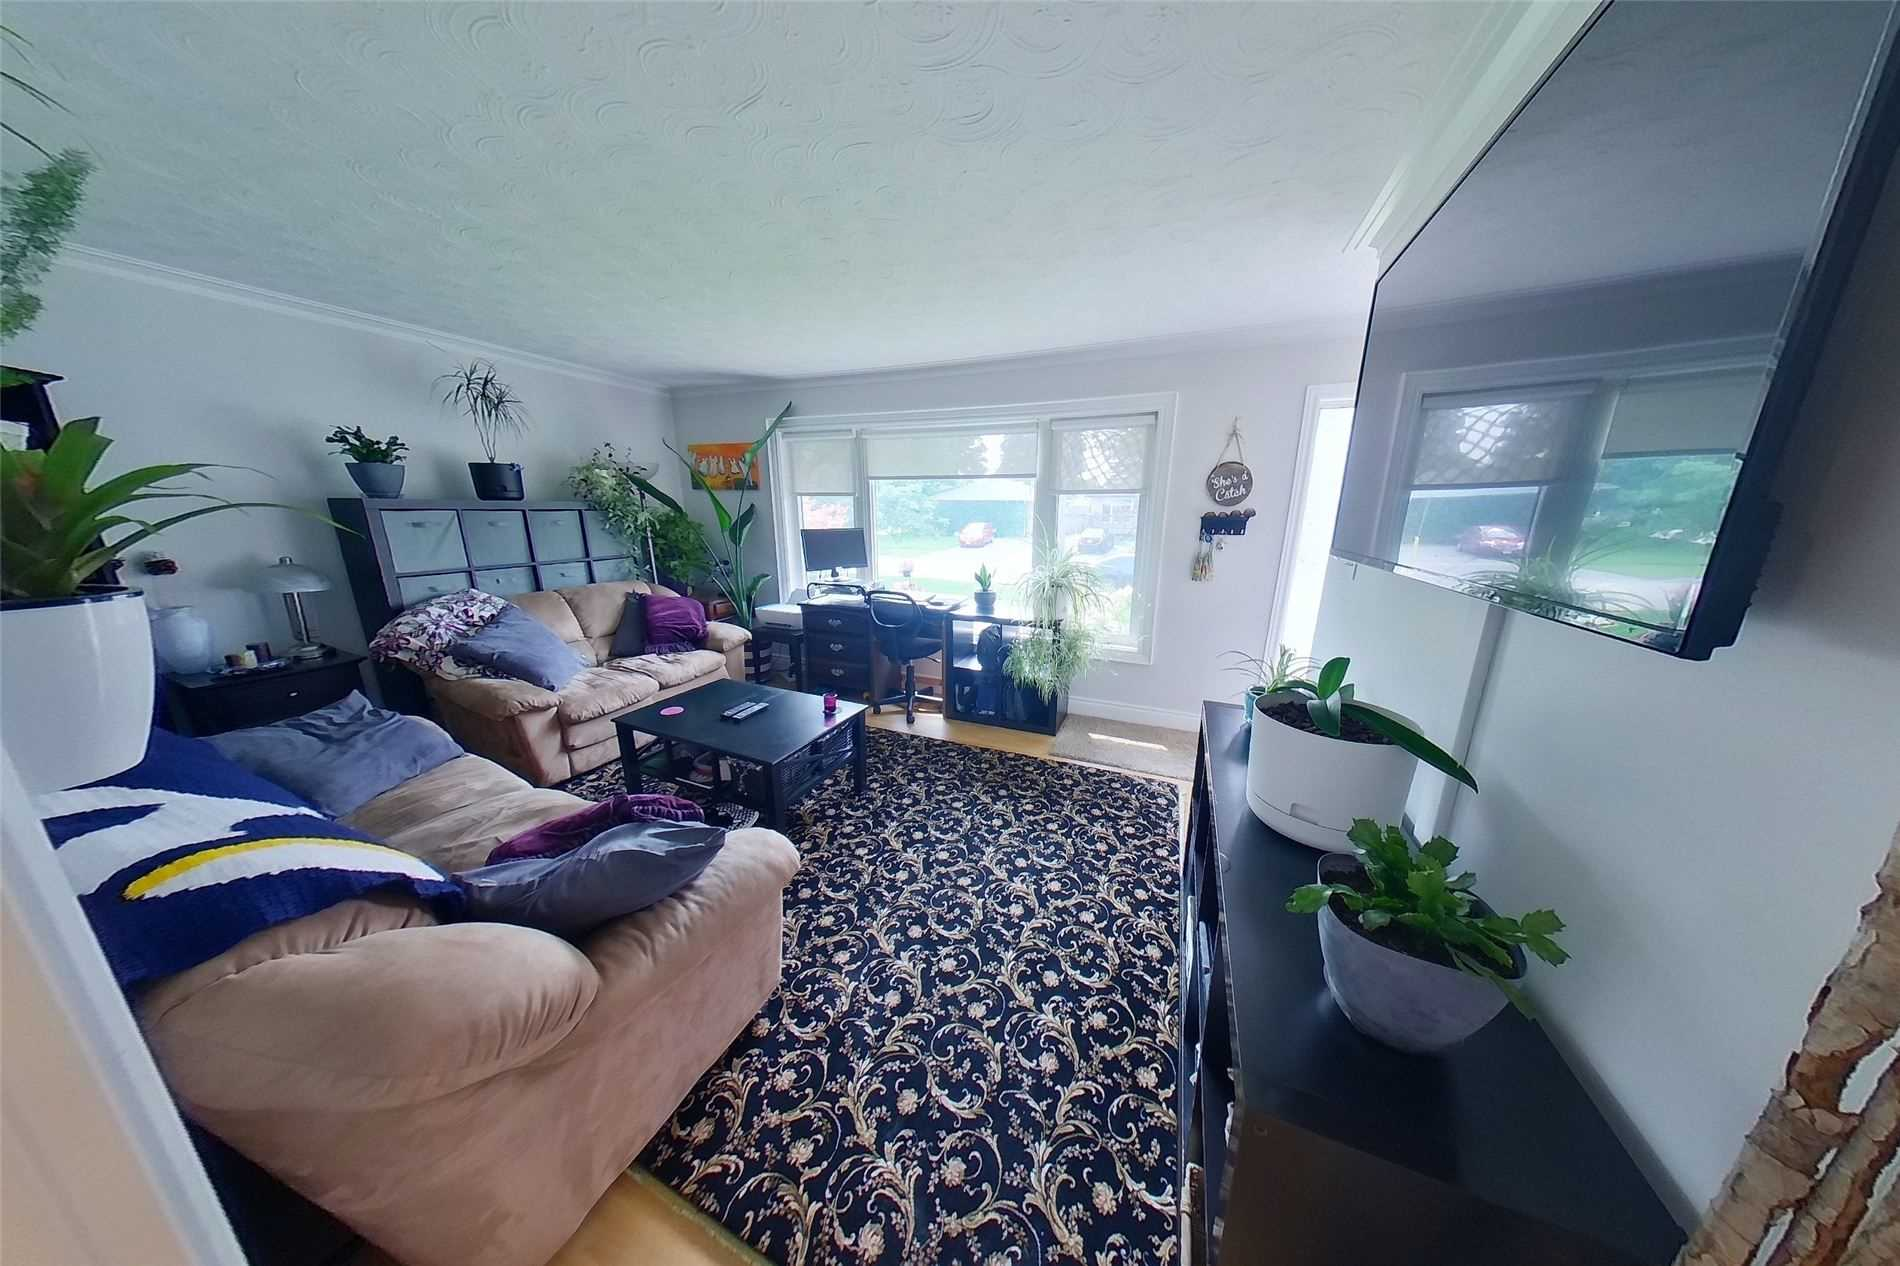 Detached house For Sale In Halton Hills - 56 Mcintyre Cres, Halton Hills, Ontario, Canada L7G1N3 , 3 Bedrooms Bedrooms, ,2 BathroomsBathrooms,Detached,For Sale,Mcintyre